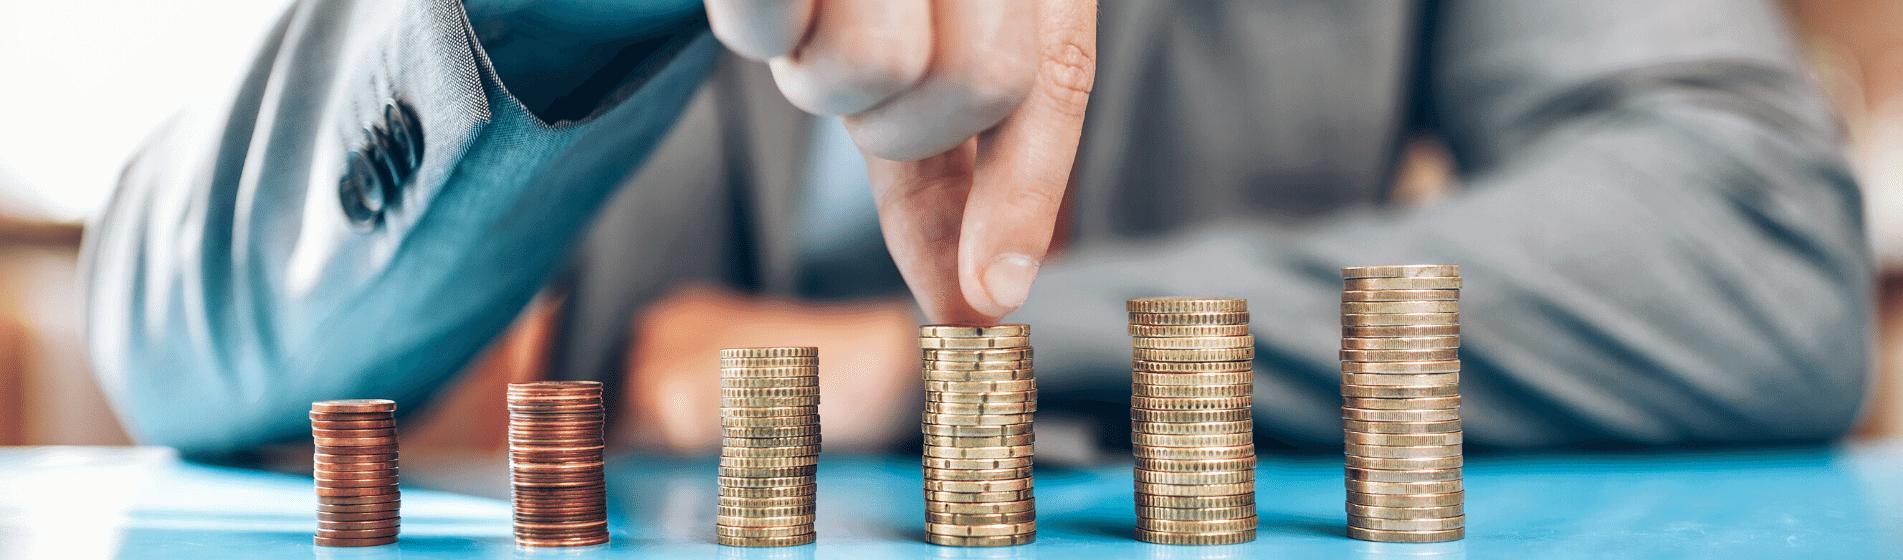 Five International High Yield Savings Accounts